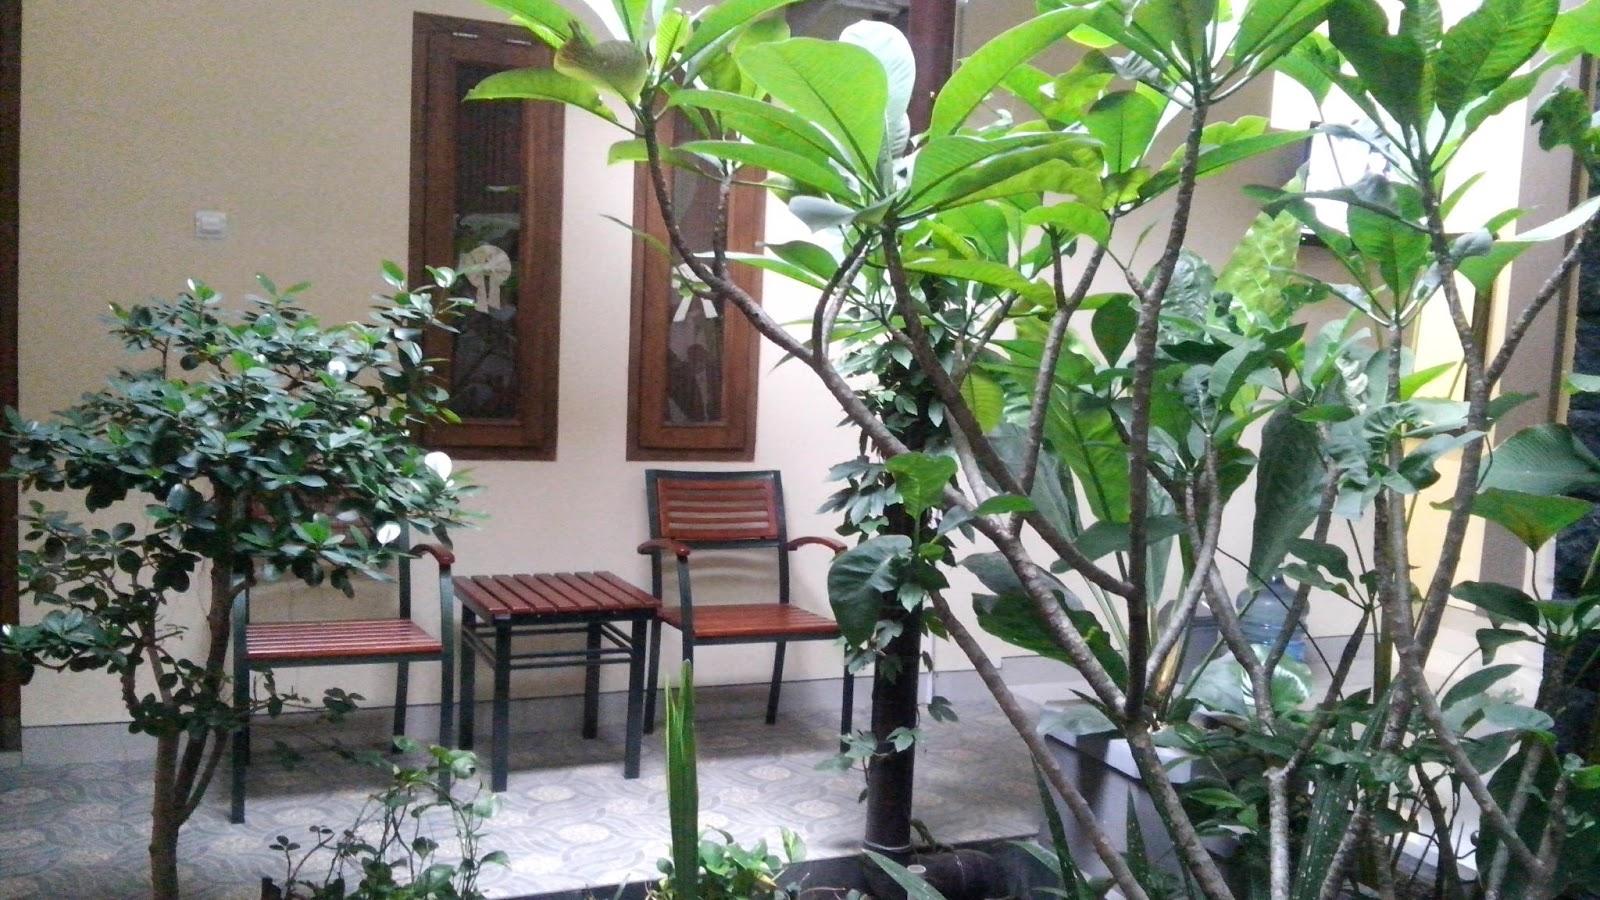 Panduan Wisata Banda Aceh, NAD | Endah Murniwati